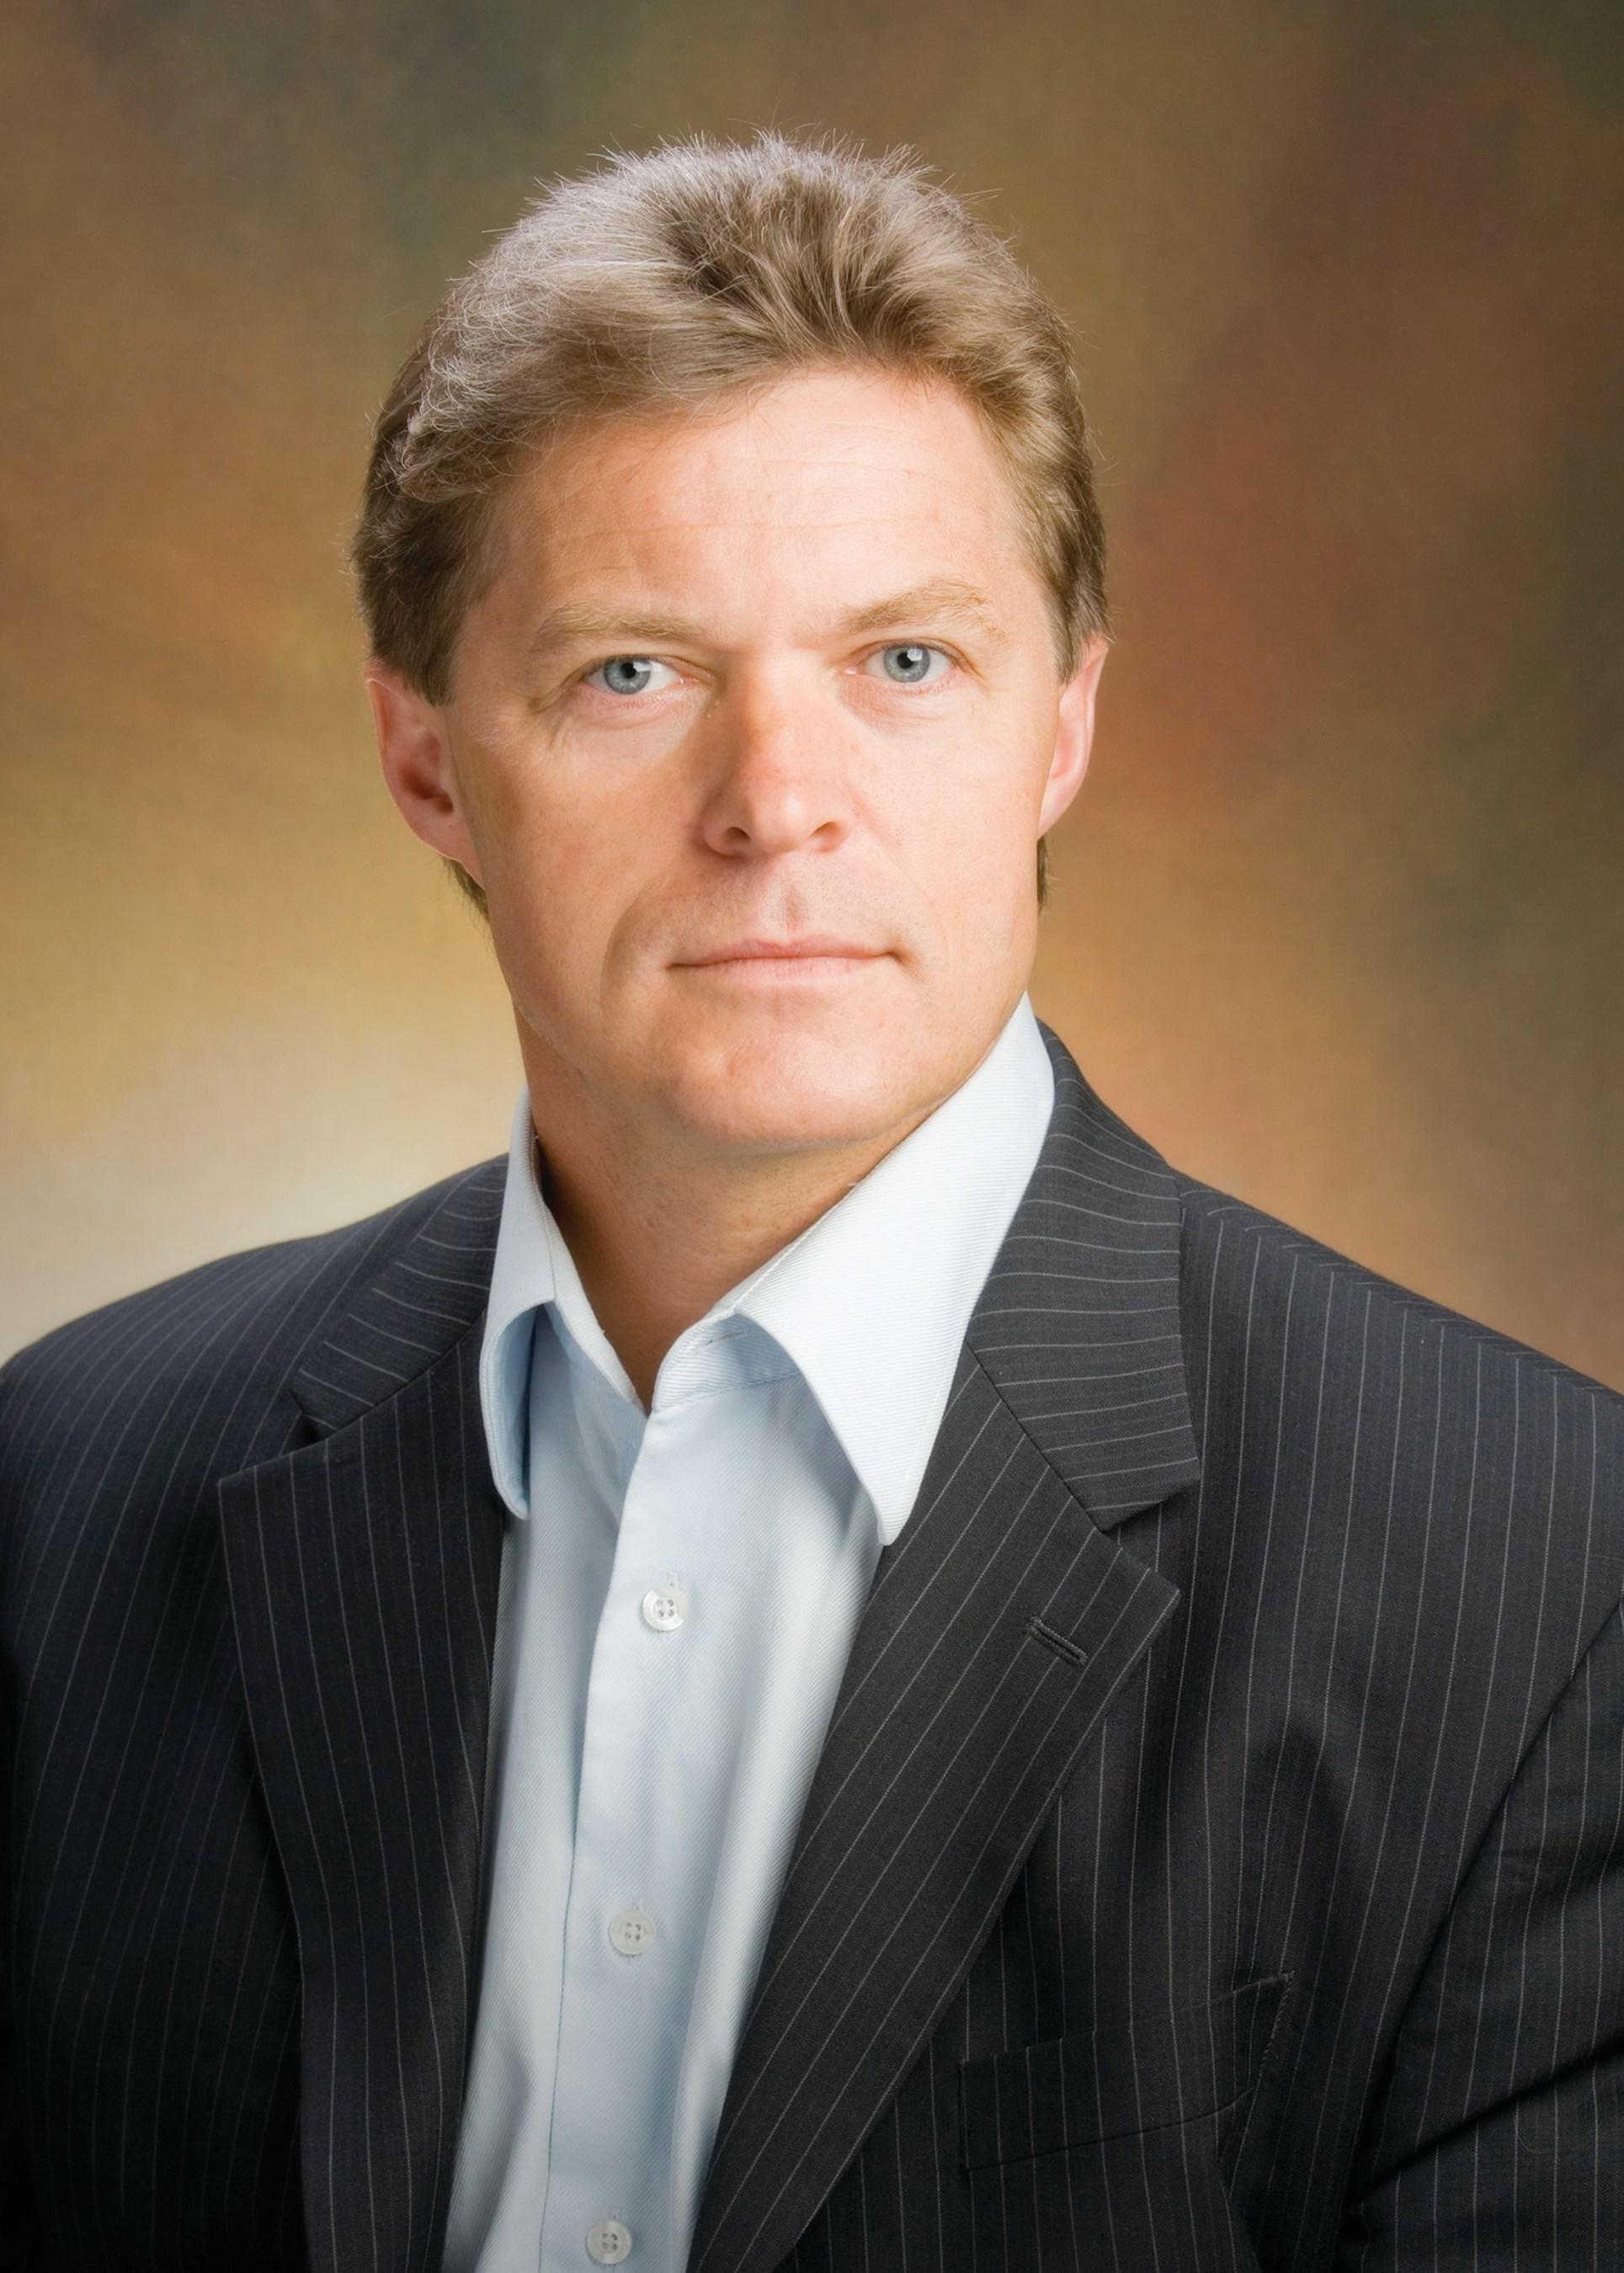 Dr. Hakon Hakonarson is the director of the Center for Applied Genomics at The Children's Hospital of Philadelphia